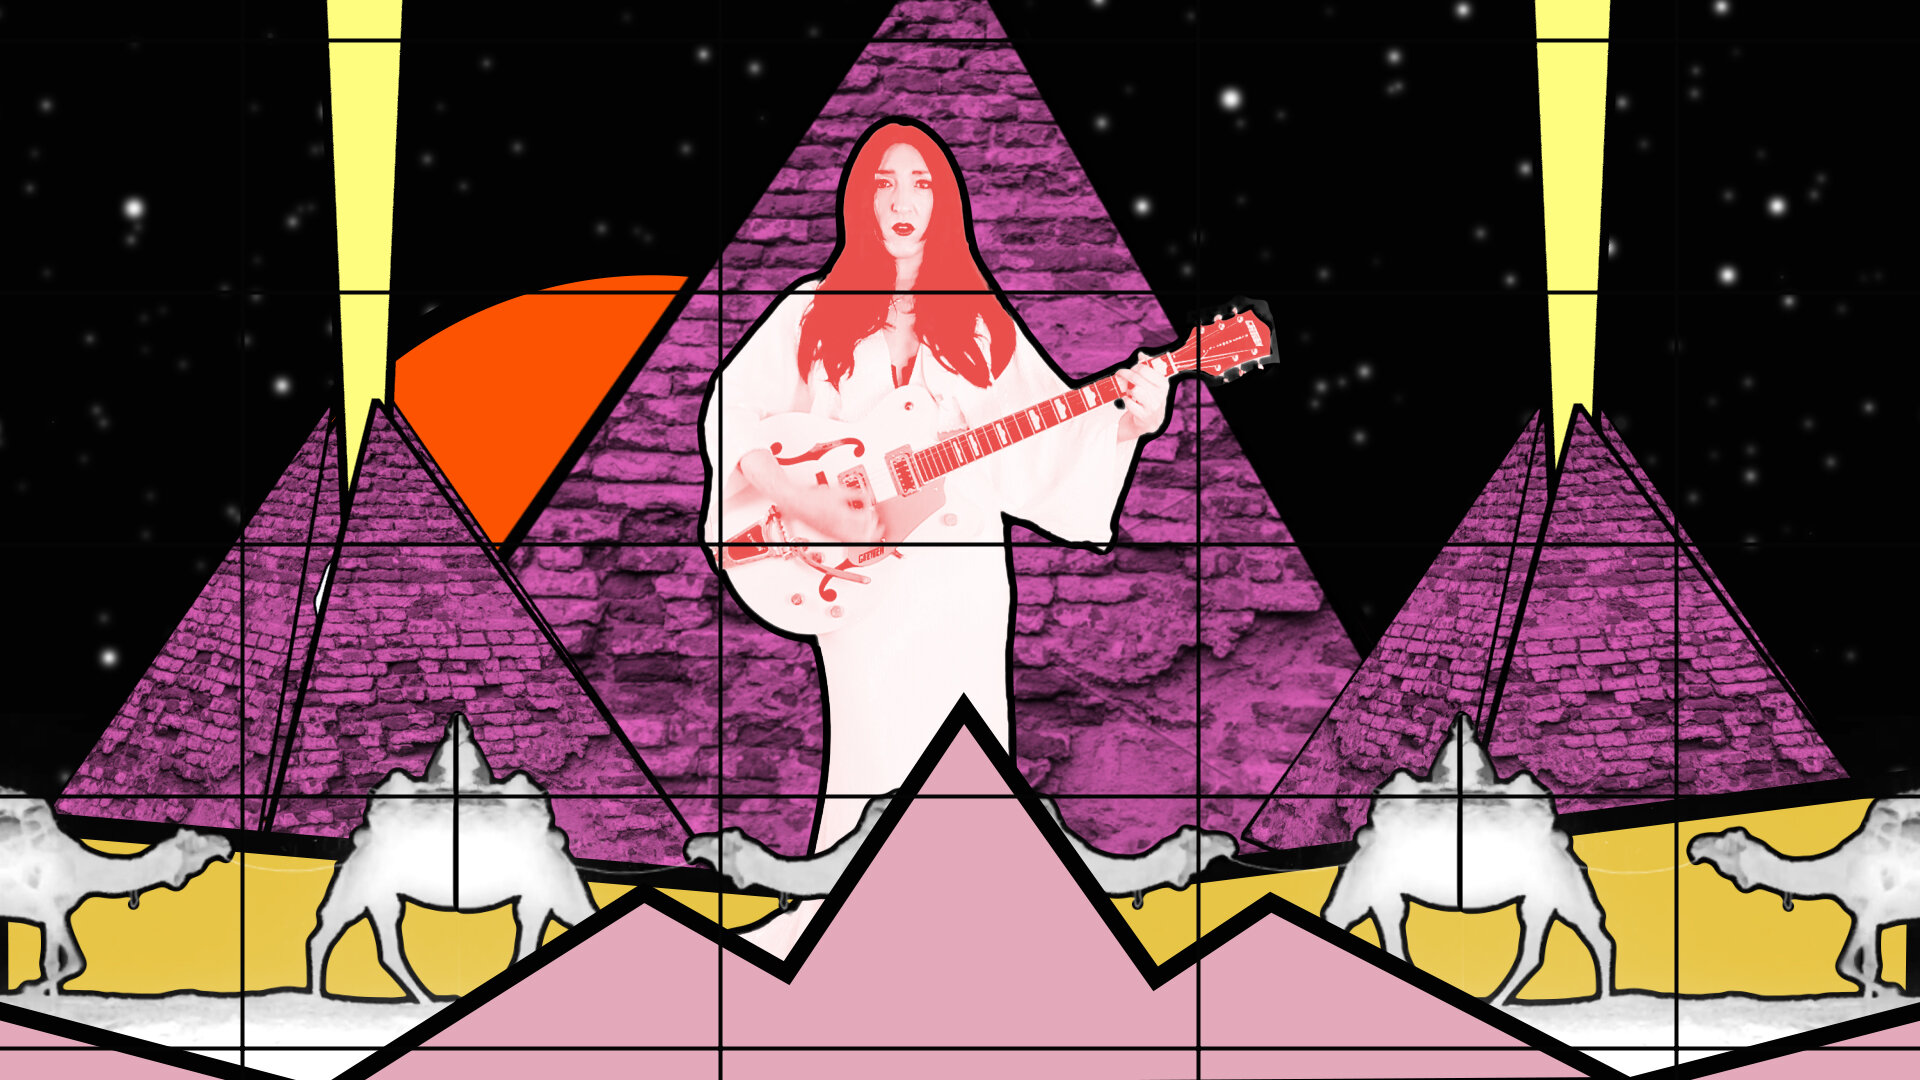 HEAVENS GATE - Pyramids _05156.jpg